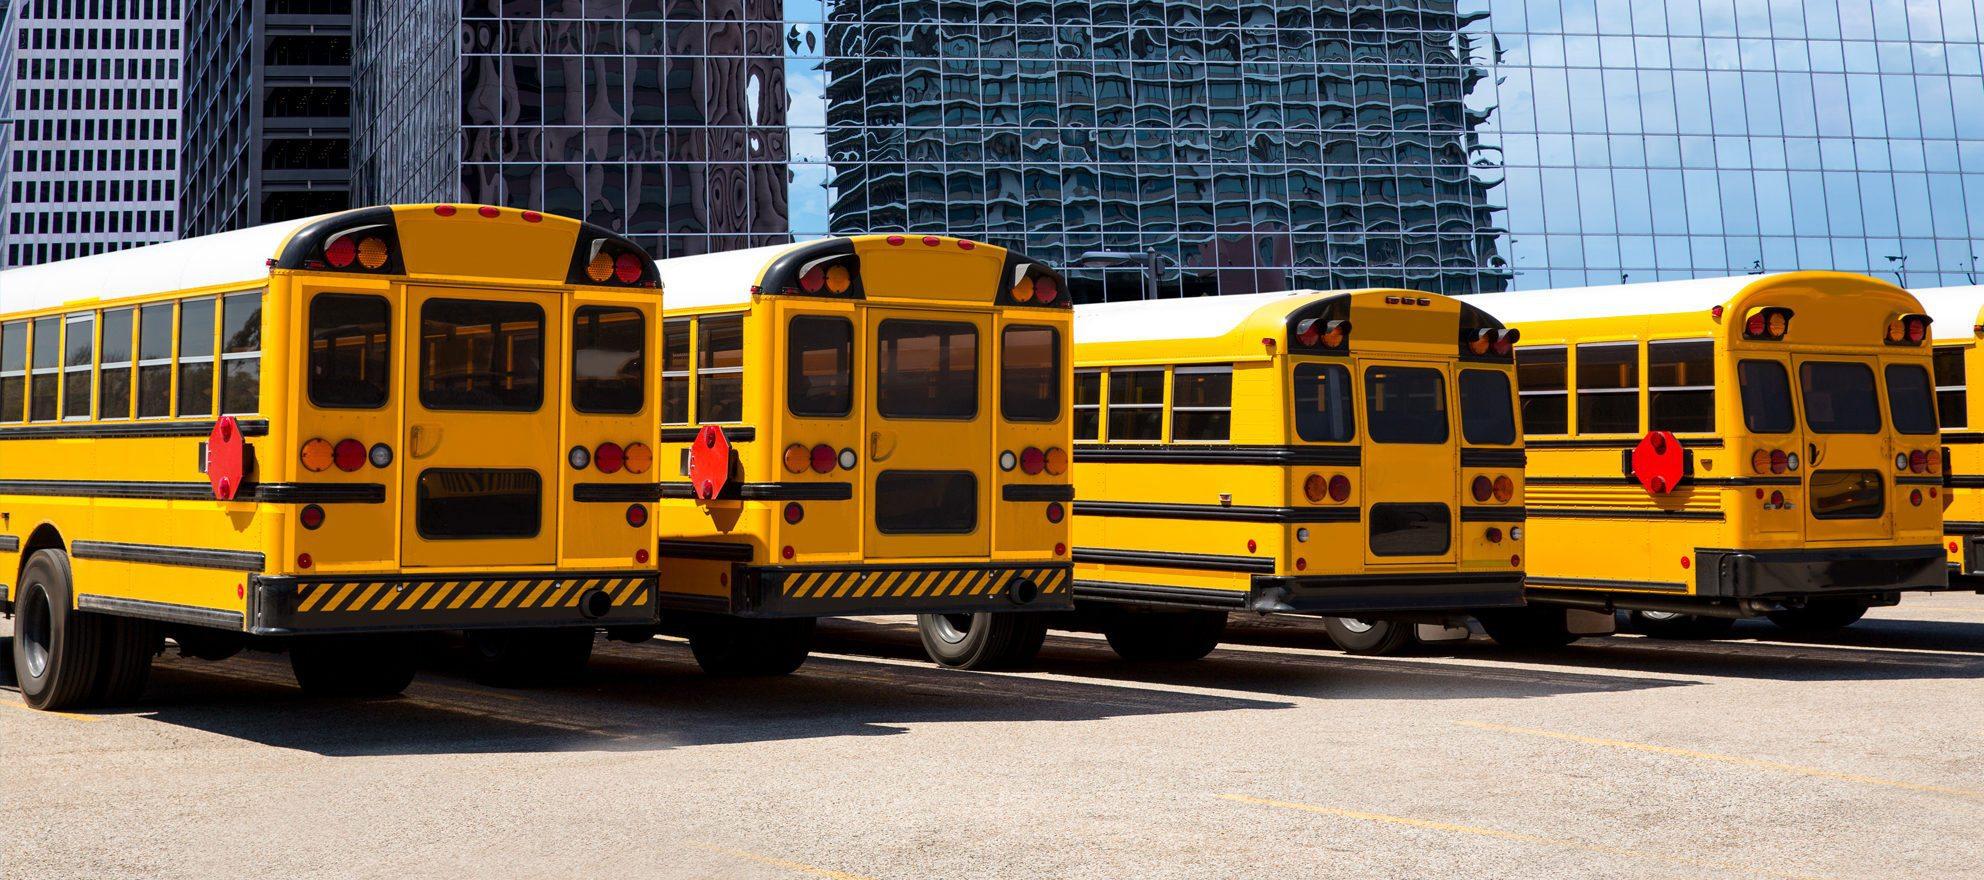 Texas Education Agency list ranks Houston schools among state's worst